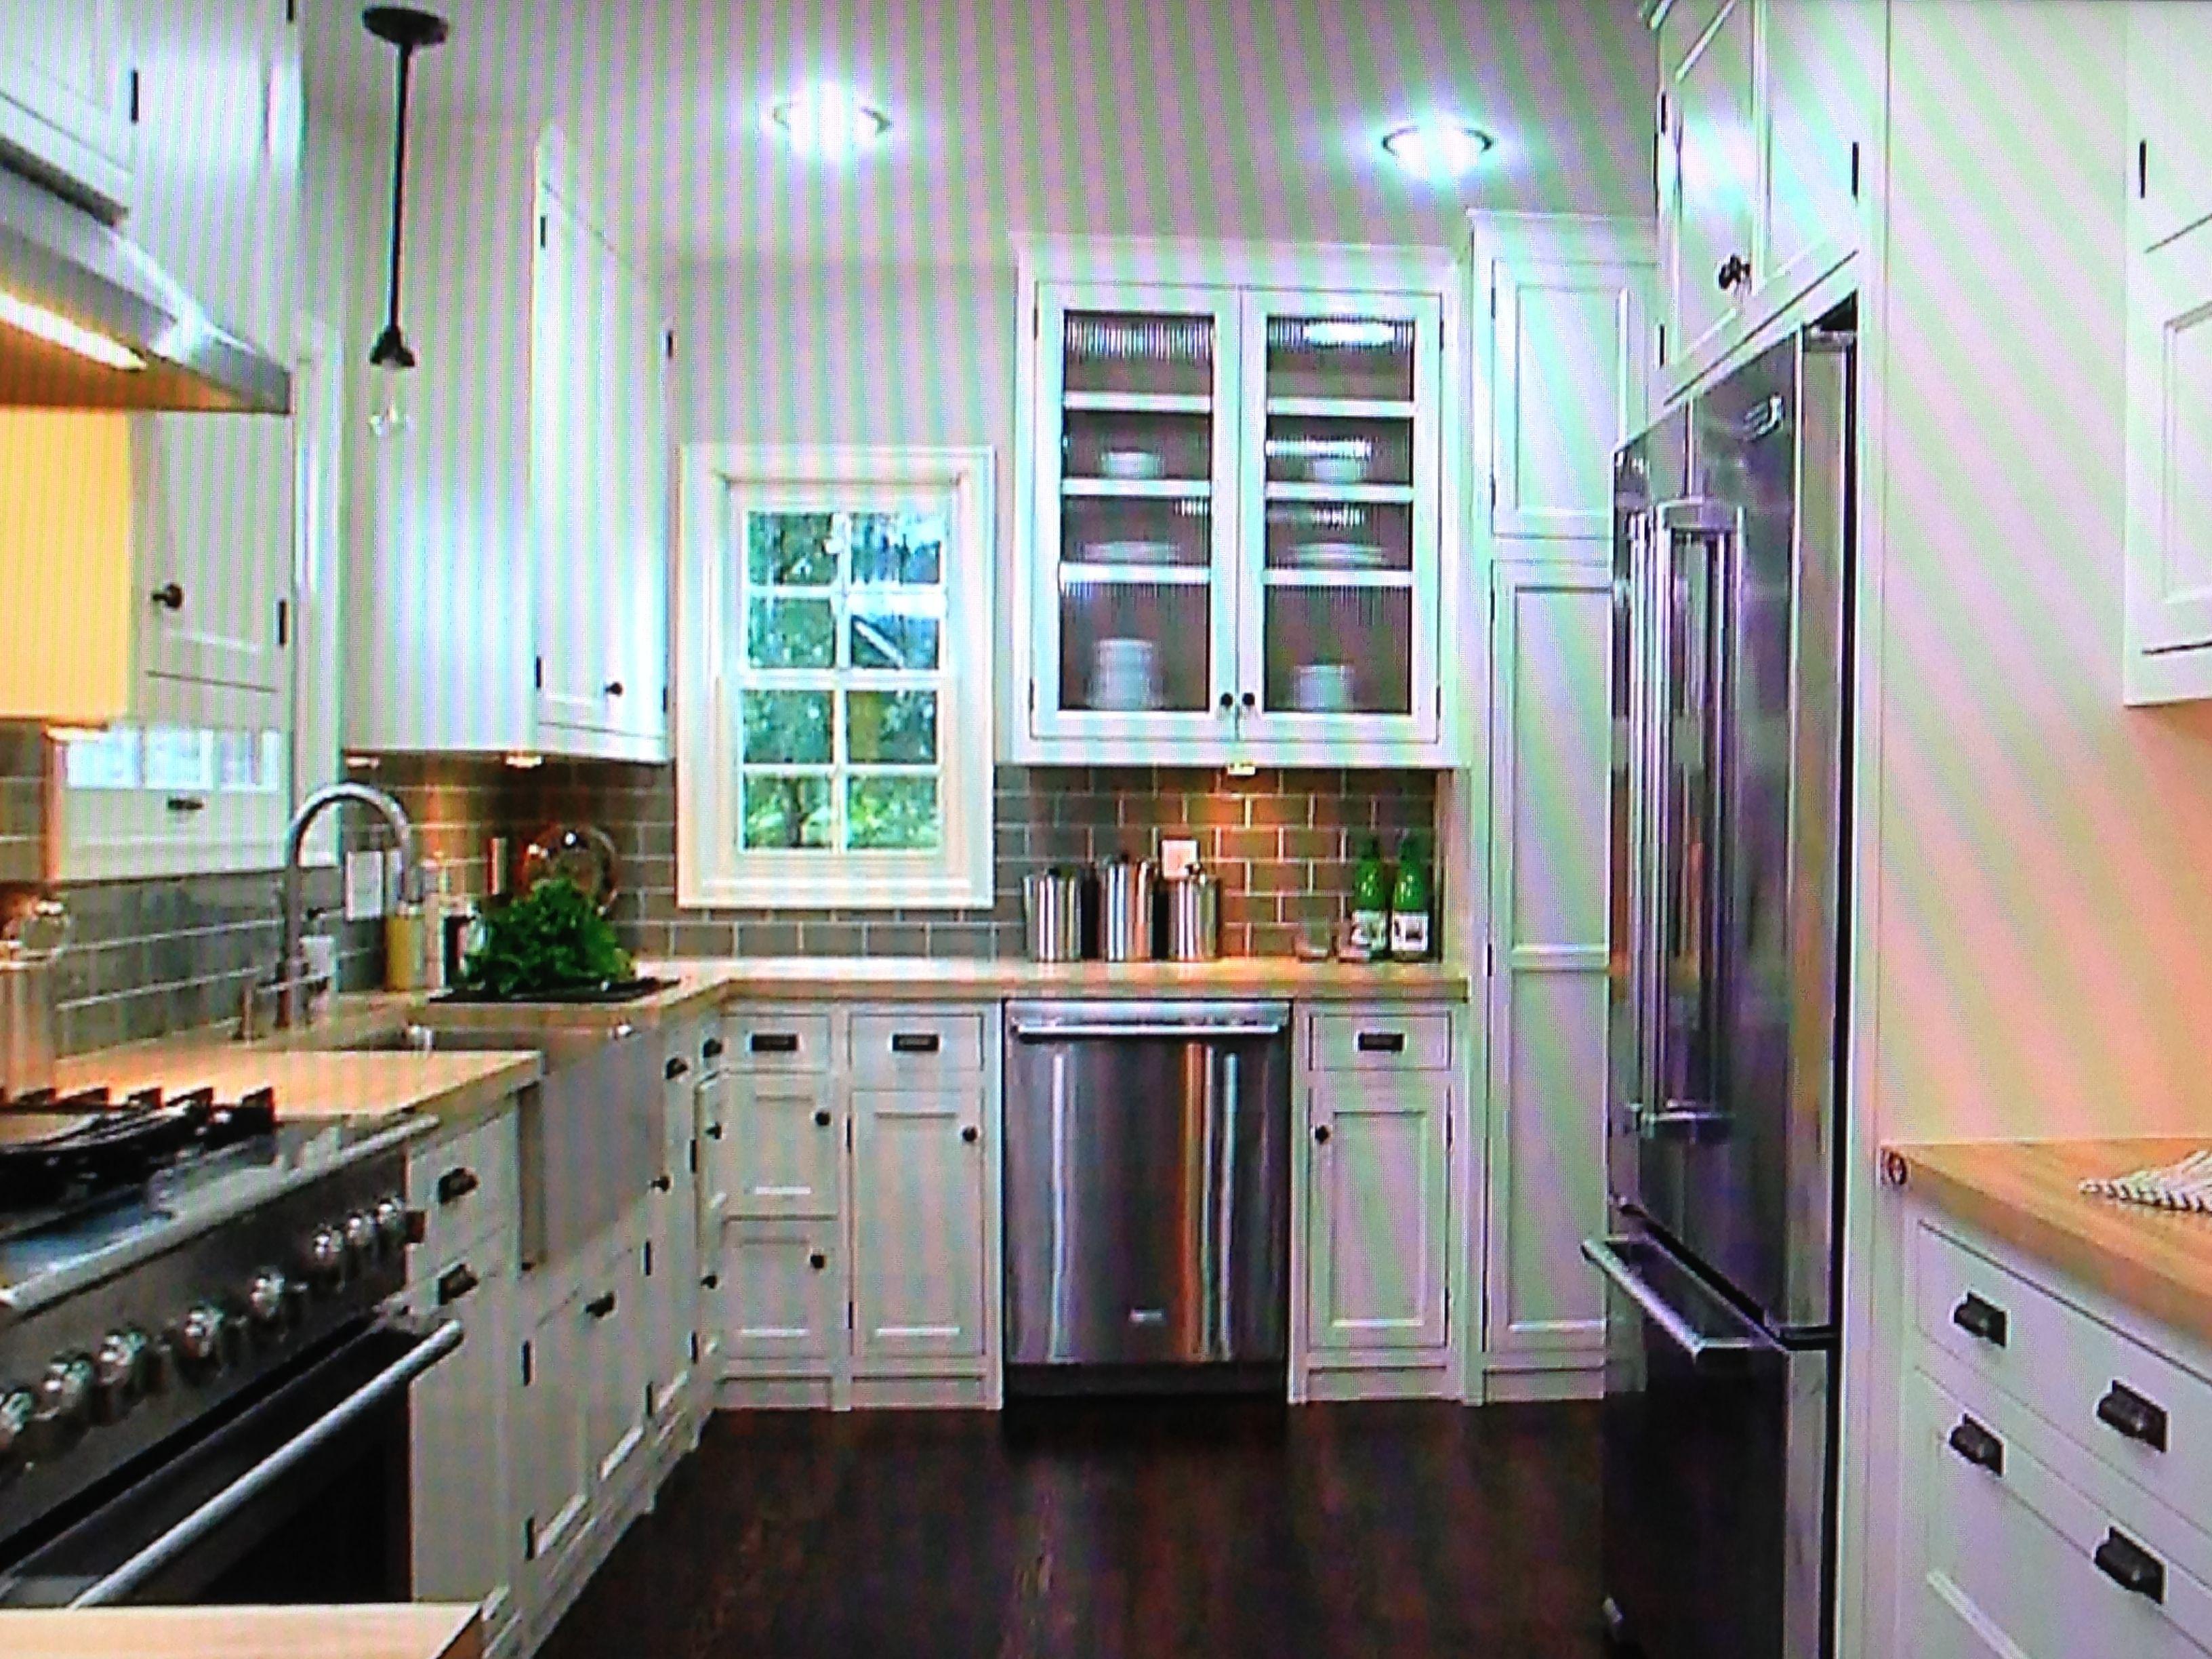 Charmant Rehab Addict Kitchen From Latest Episode U003c3 Want